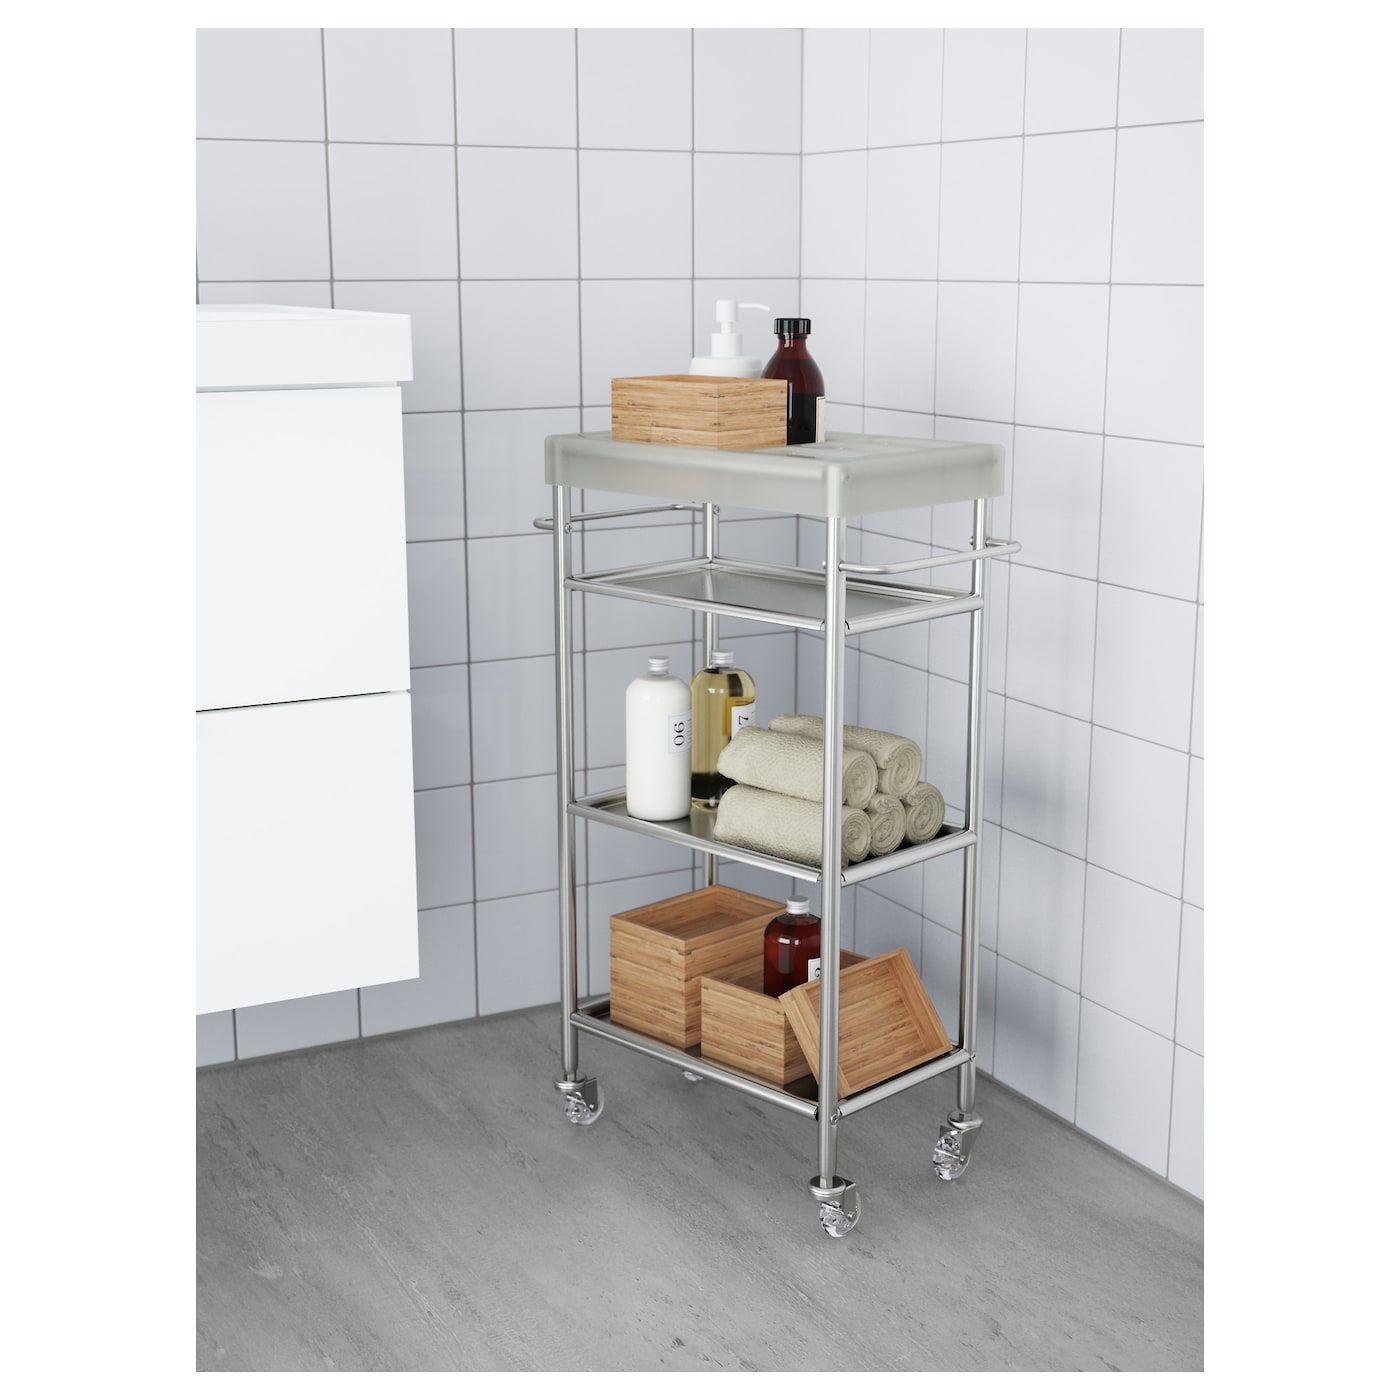 GRUNDTAL Cart - stainless steel - IKEA  Ikea, Ikea catalog, Shelves